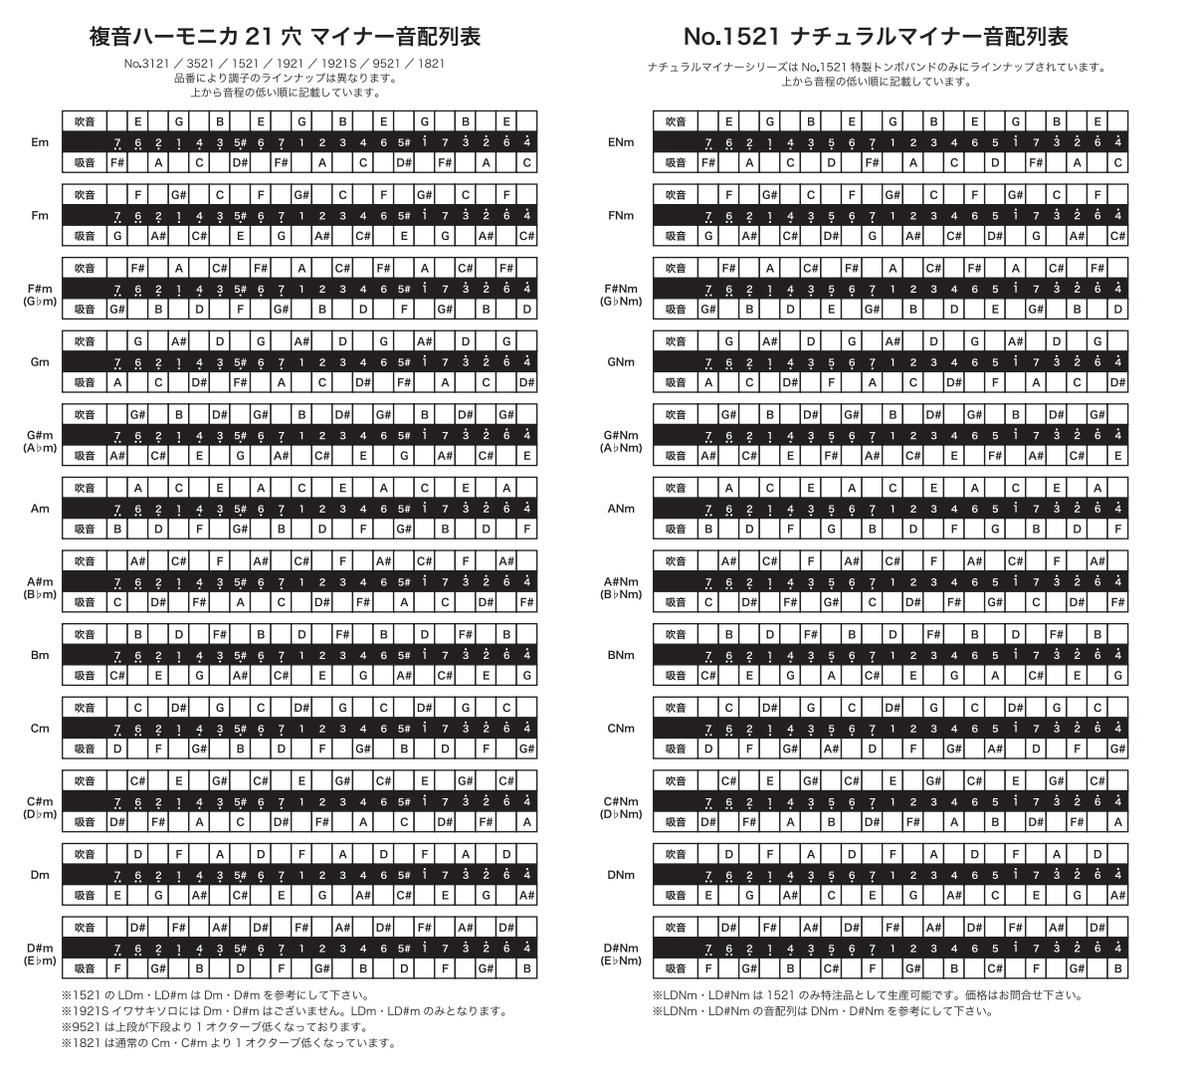 TOMBO/複音ハーモニカNO.1521 【楽天市場】TOMBO 複音ハーモニカ NO.1521